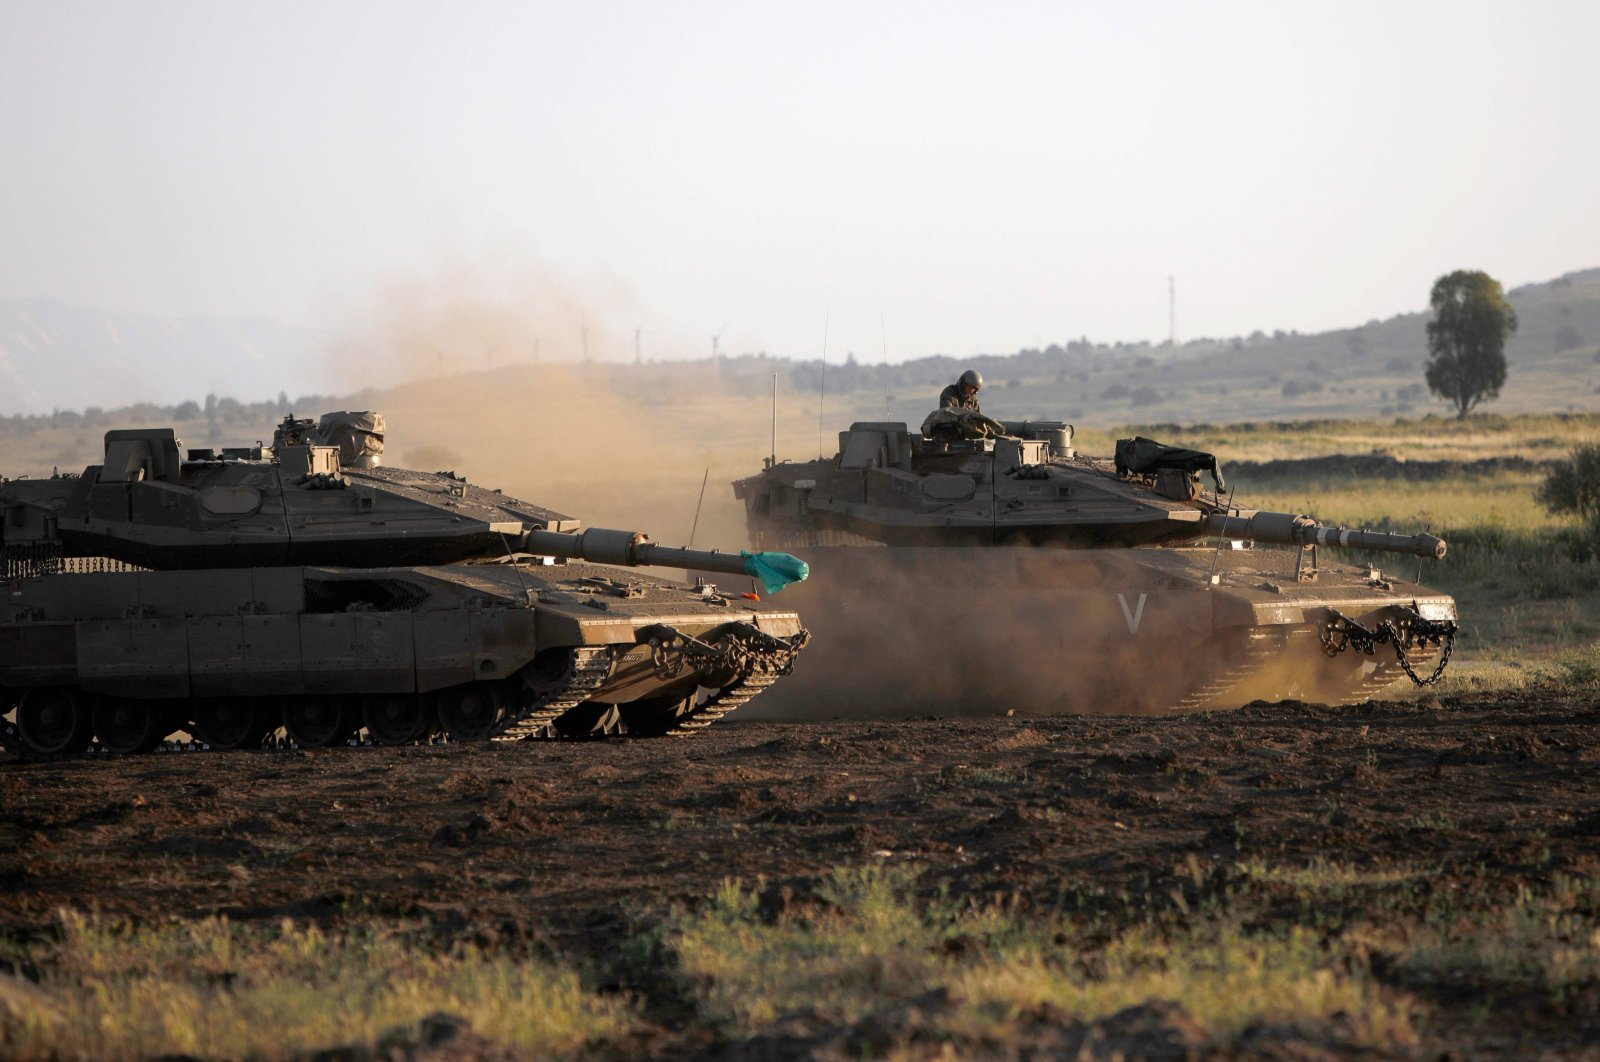 Israeli soldiers ride in Merkava Mark IV battle tanks near Moshav Alonei HaBashan in the Israeli-occupied Golan Heights, April 29, 2021. (AFP Photo)